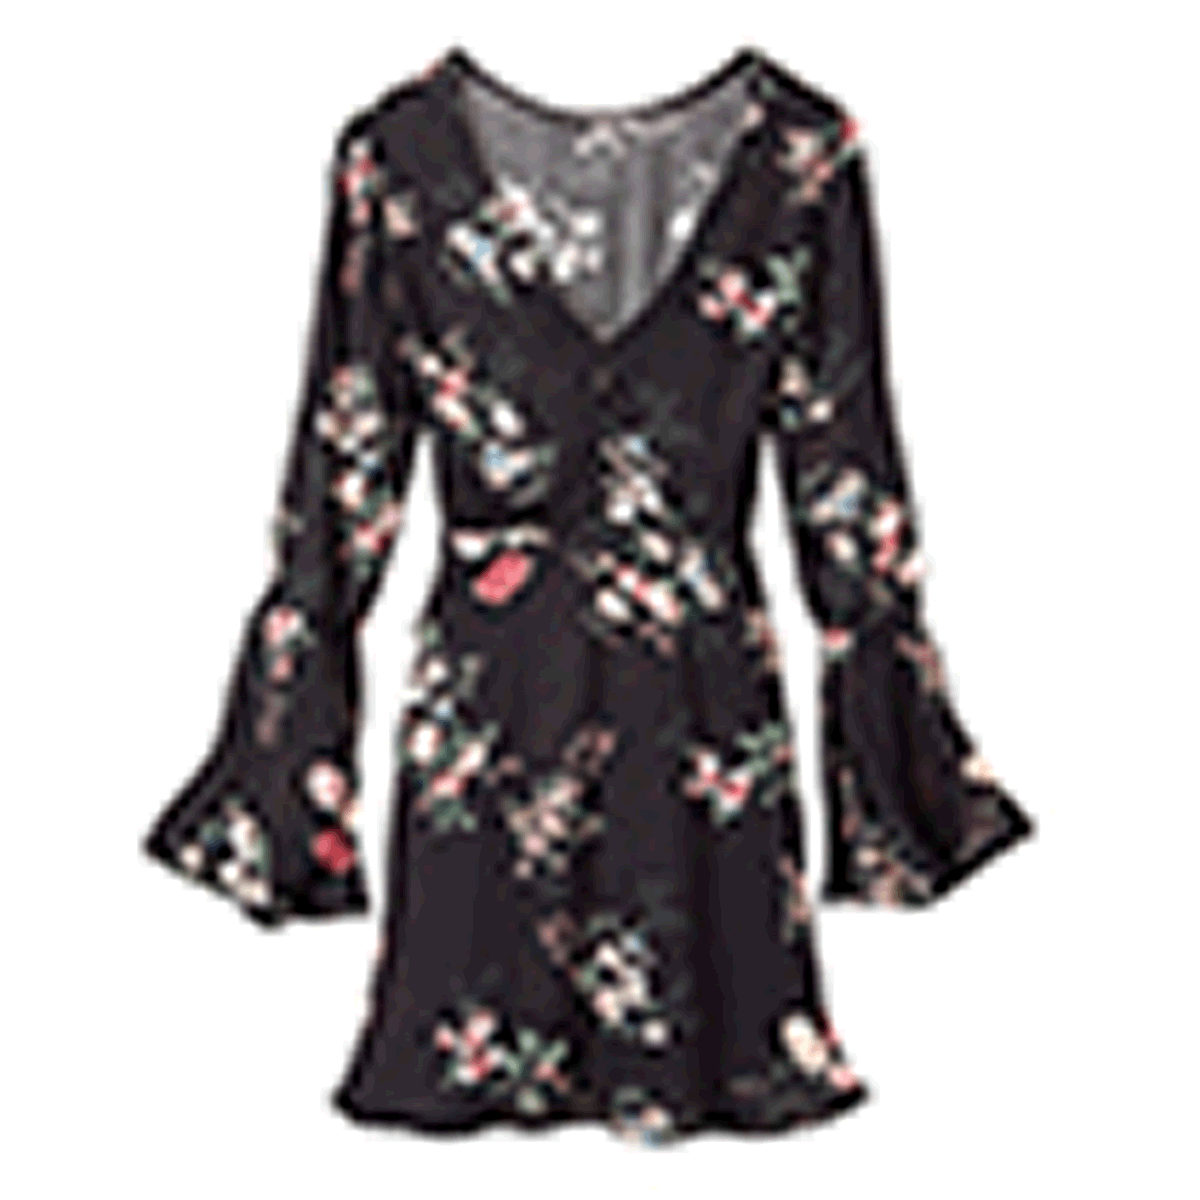 b71ea8e536f2 Dresses